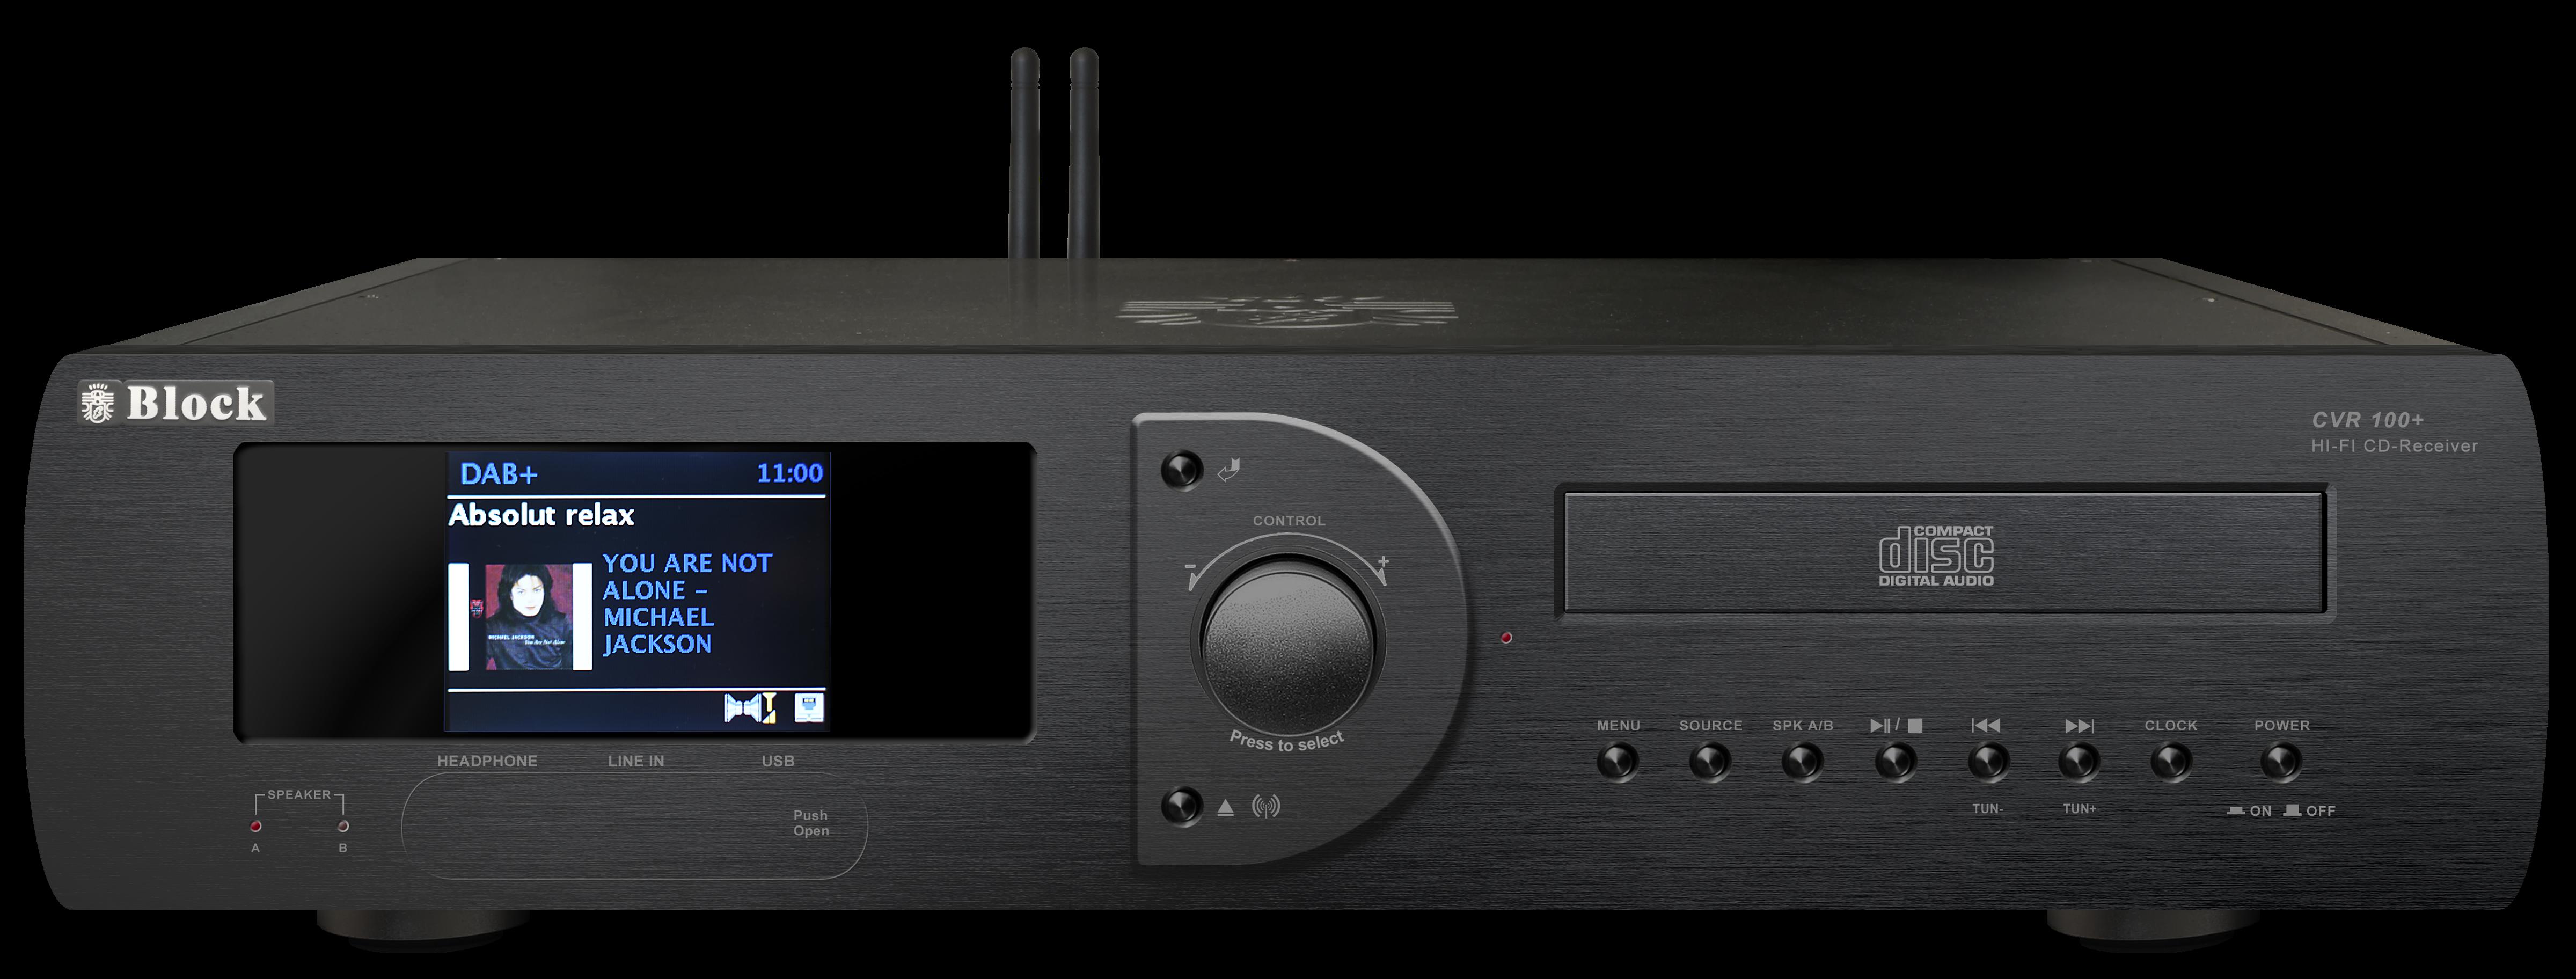 audioblock-cvr-100-plus-mkii-saphirschwarz-screen